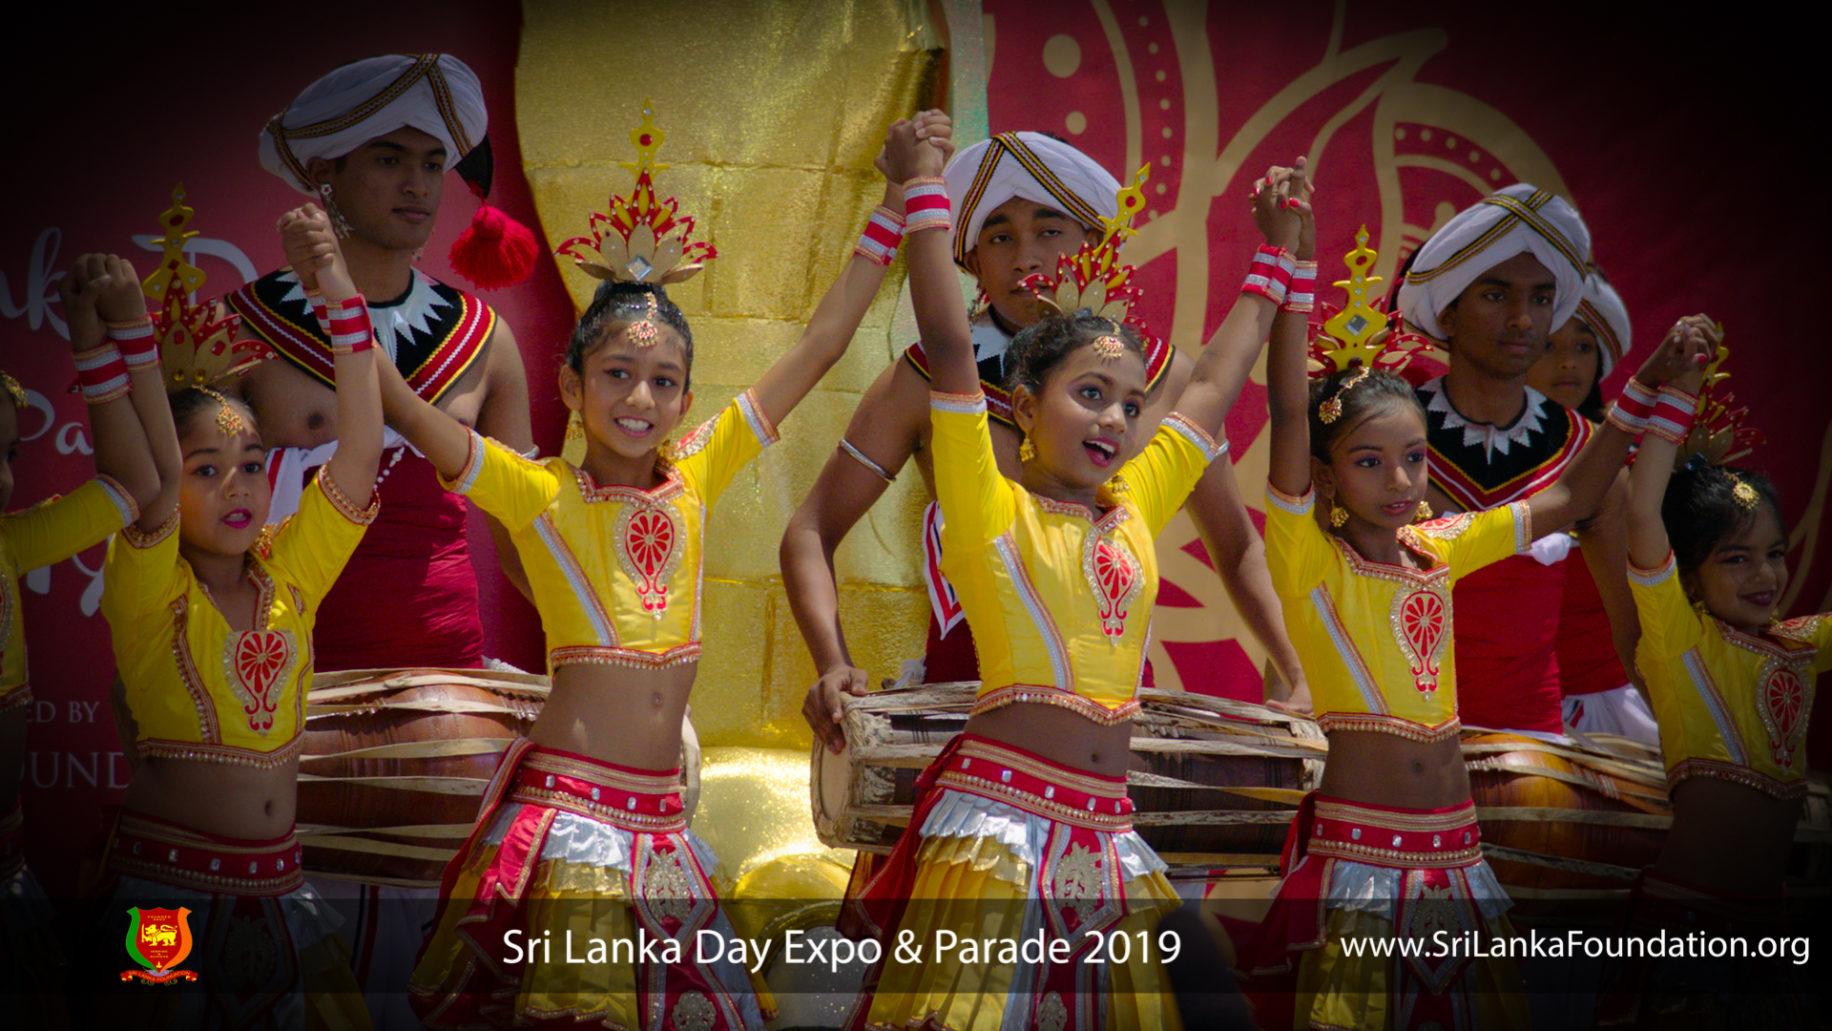 'Api Lankawe' – We are Sri Lankans – Sri Lanka Foundation Theme Song